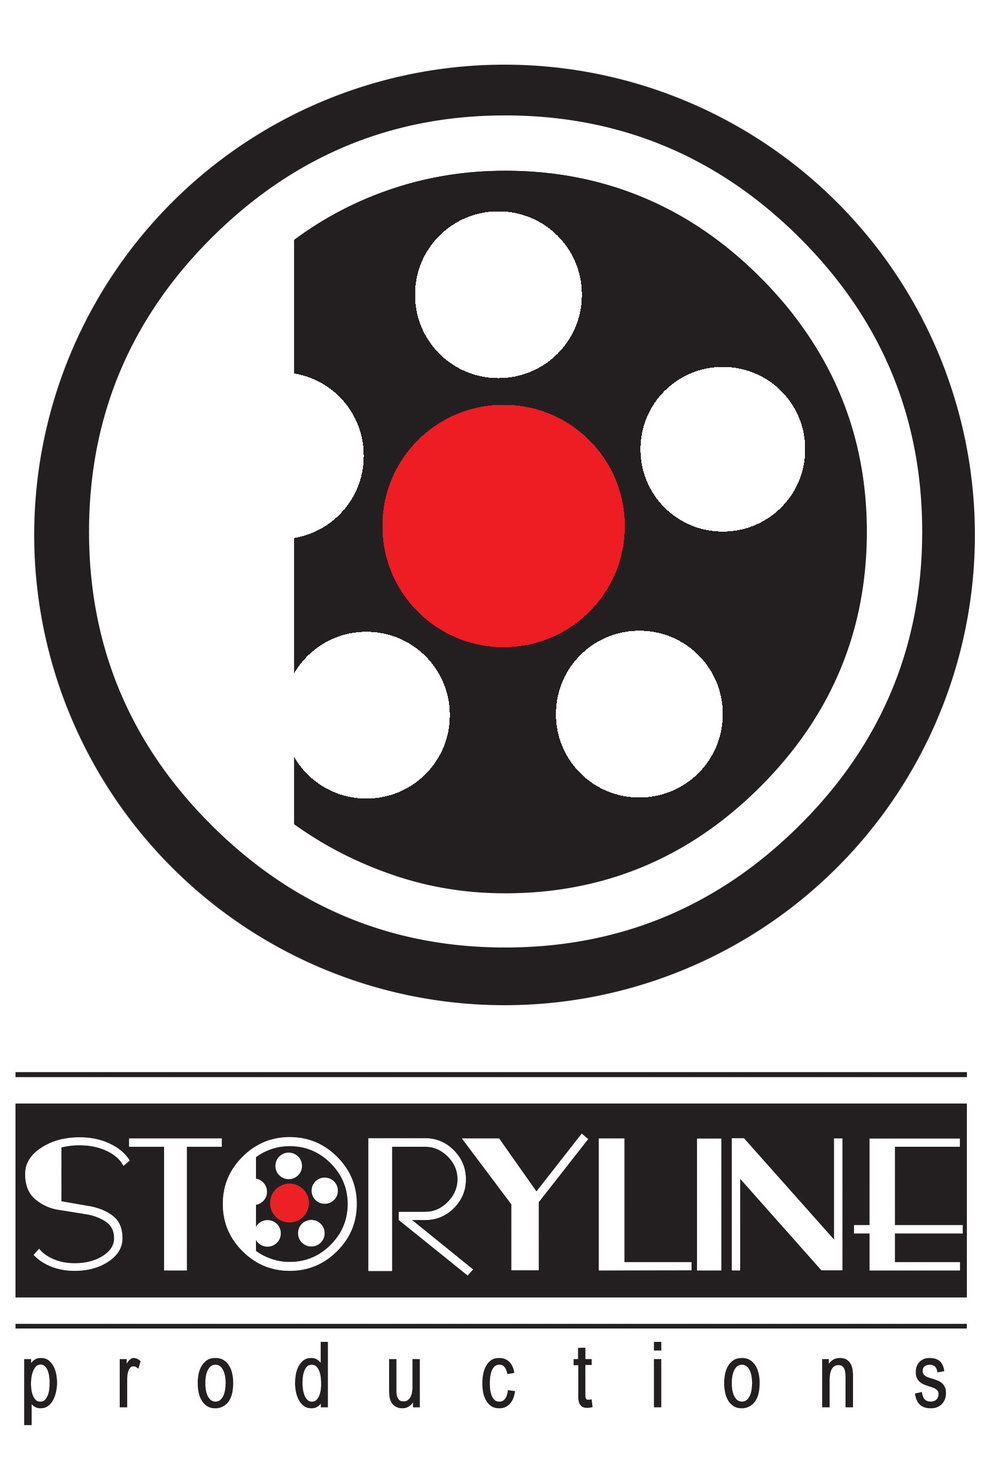 StorylineProLOGO.jpg